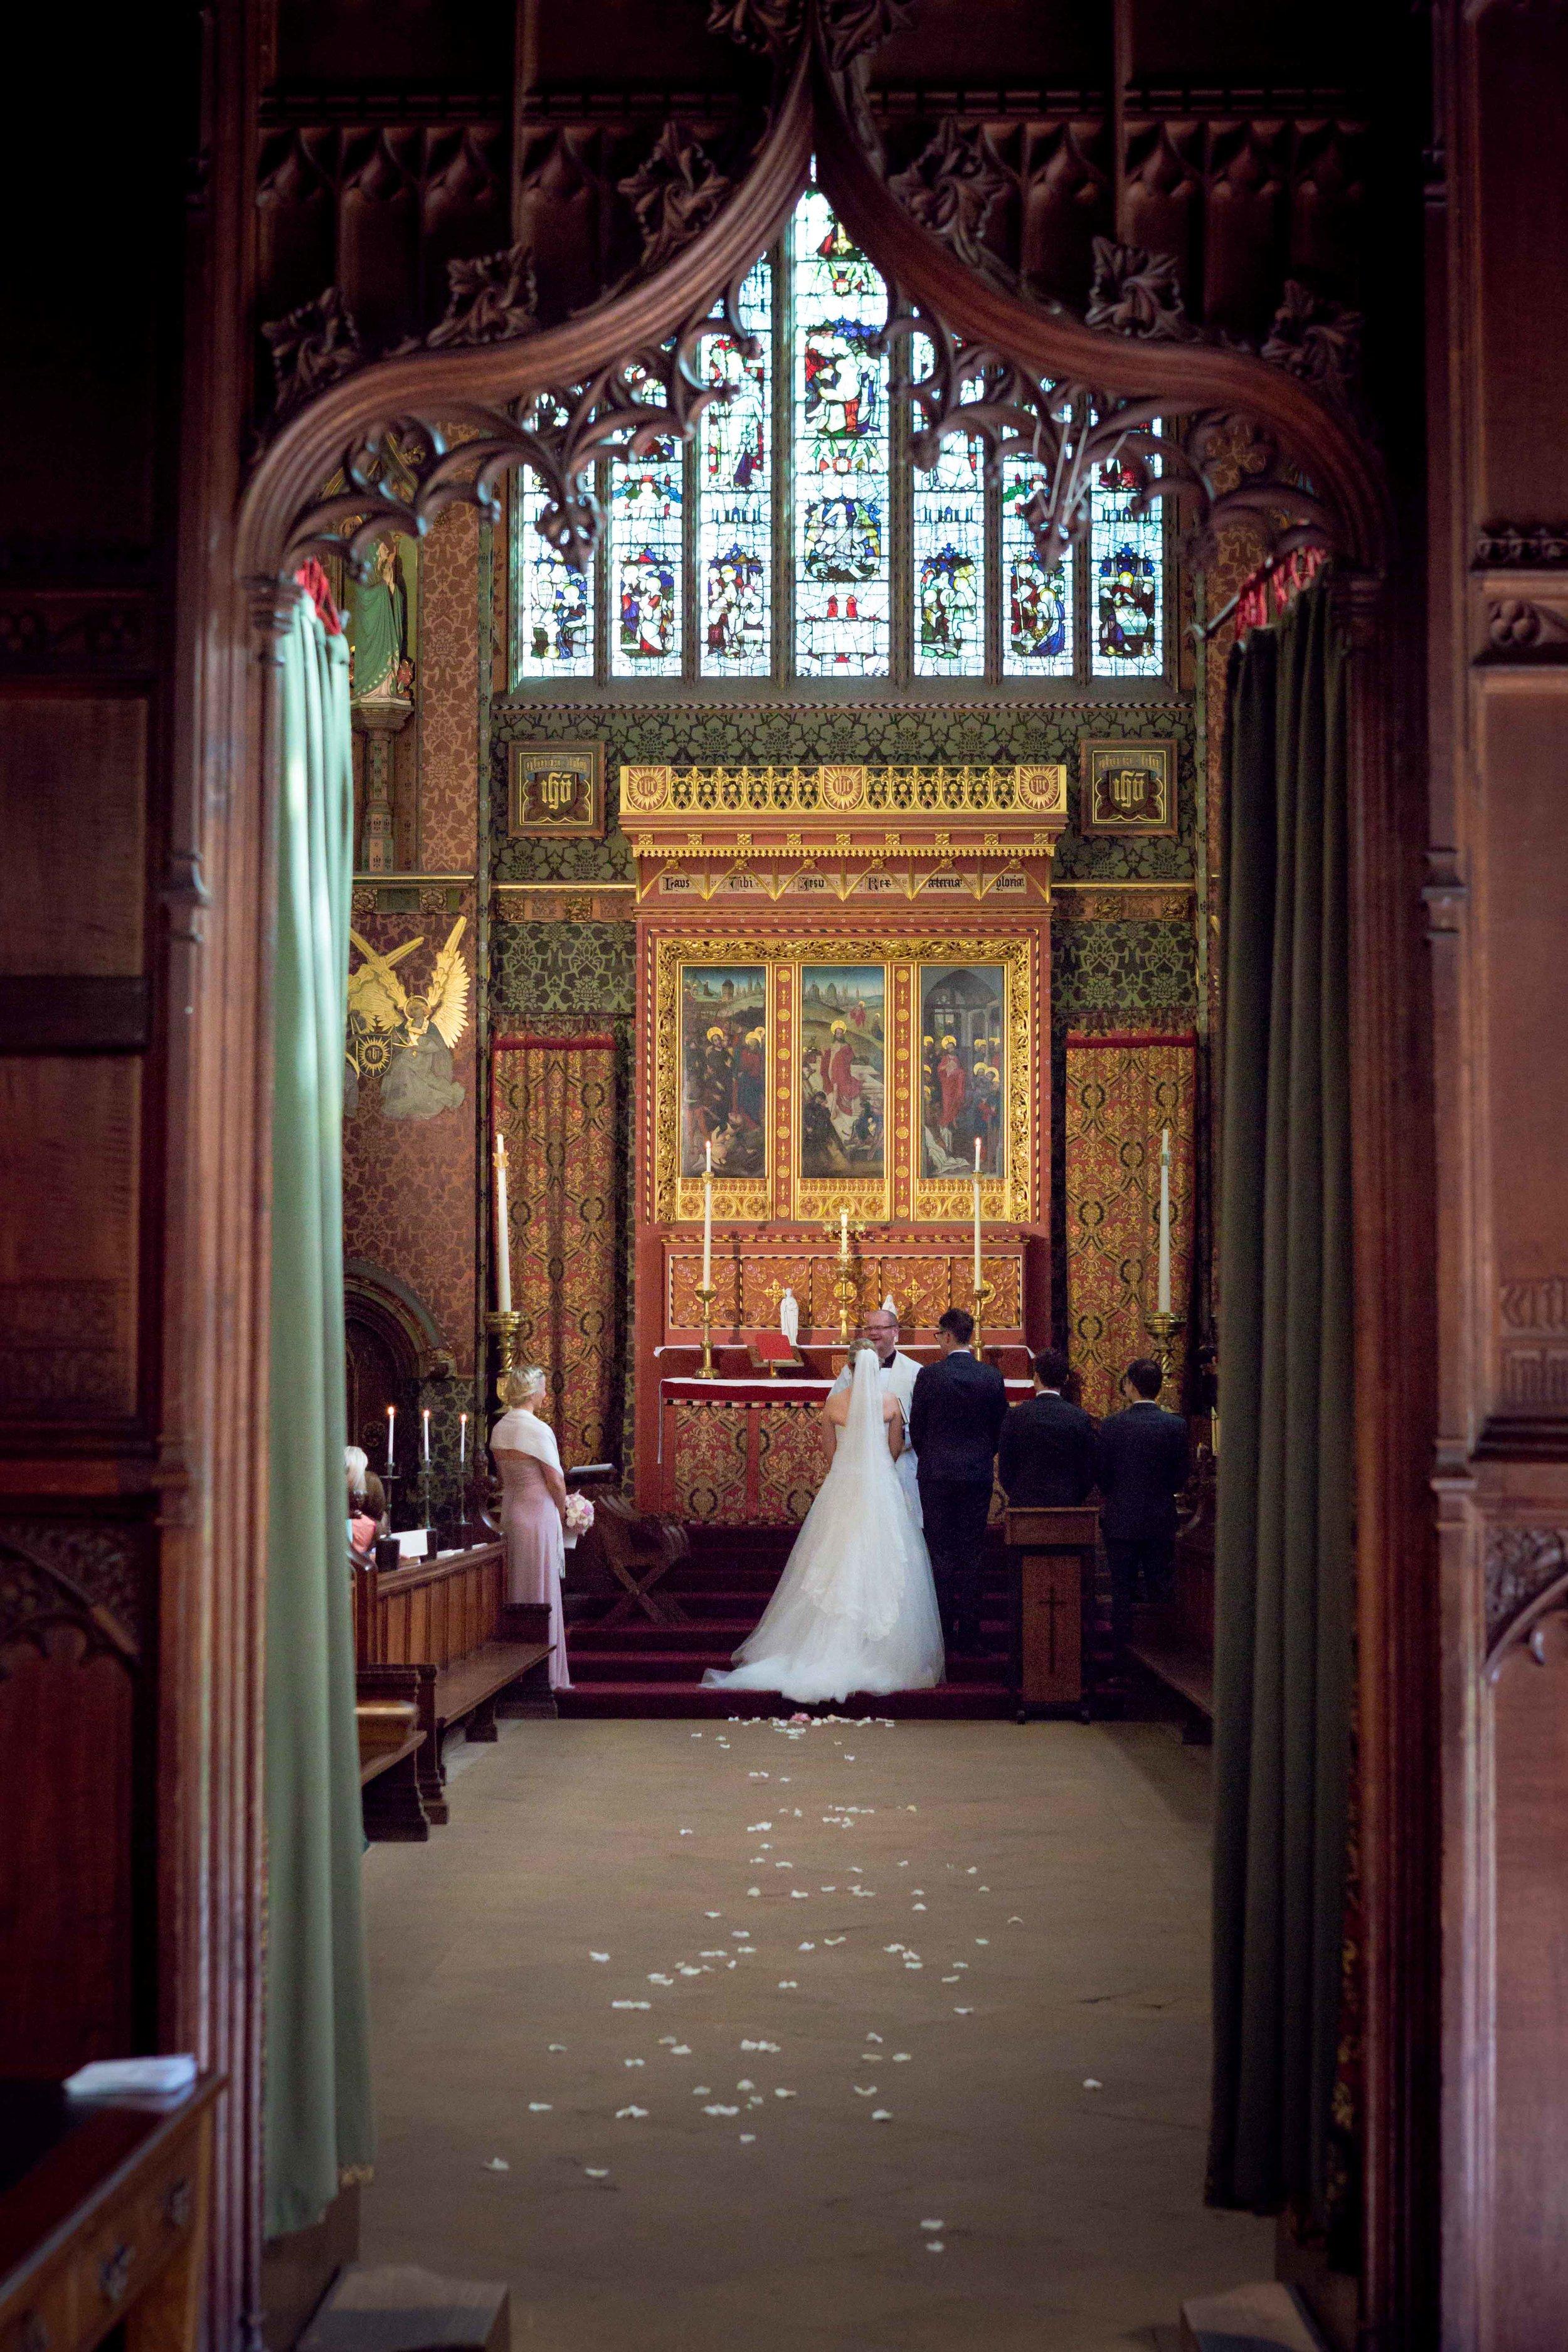 Adrian_Nicole_Charnwood_Weddings_Queens_College_Cambridge-1017.jpg